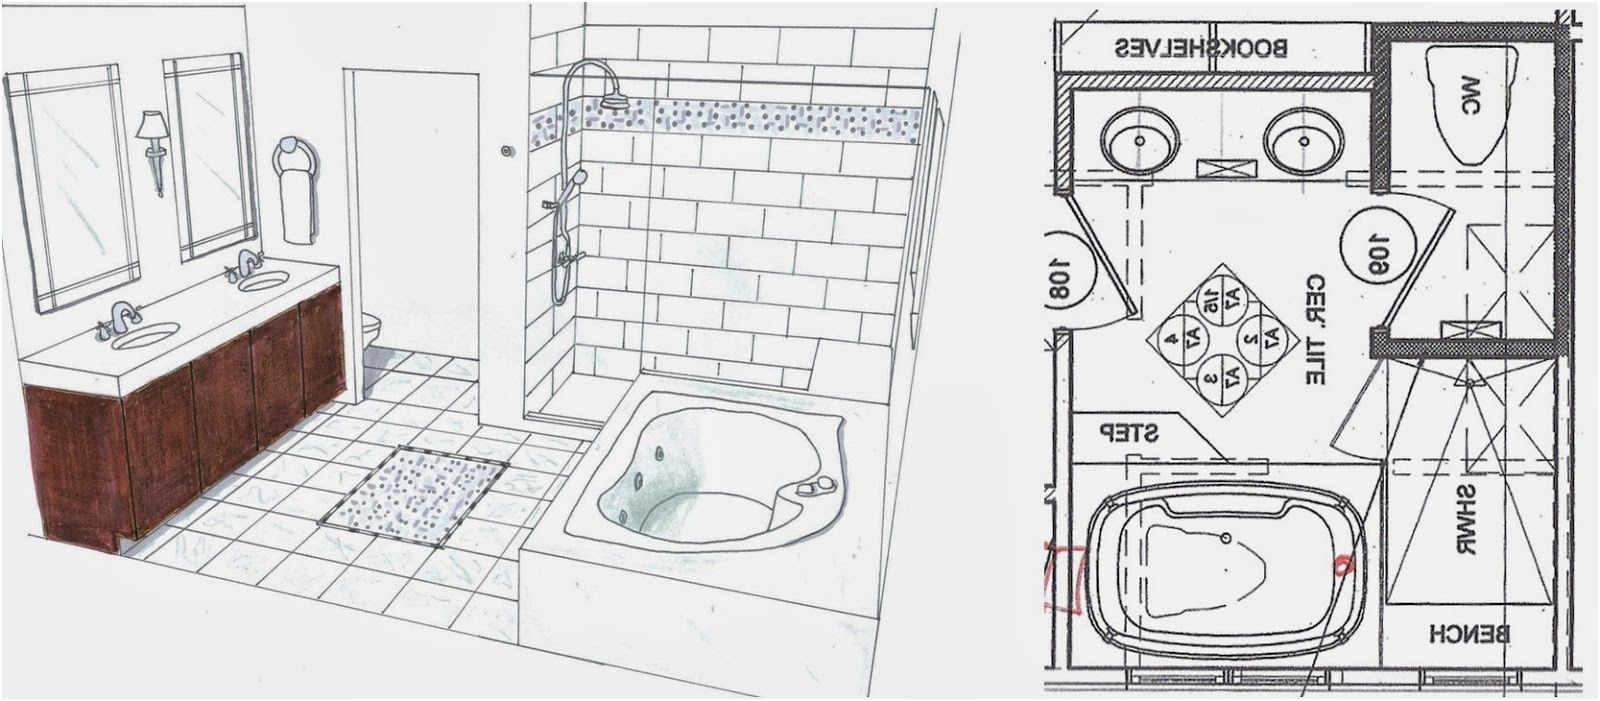 New Design A Bathroom Floor Plan